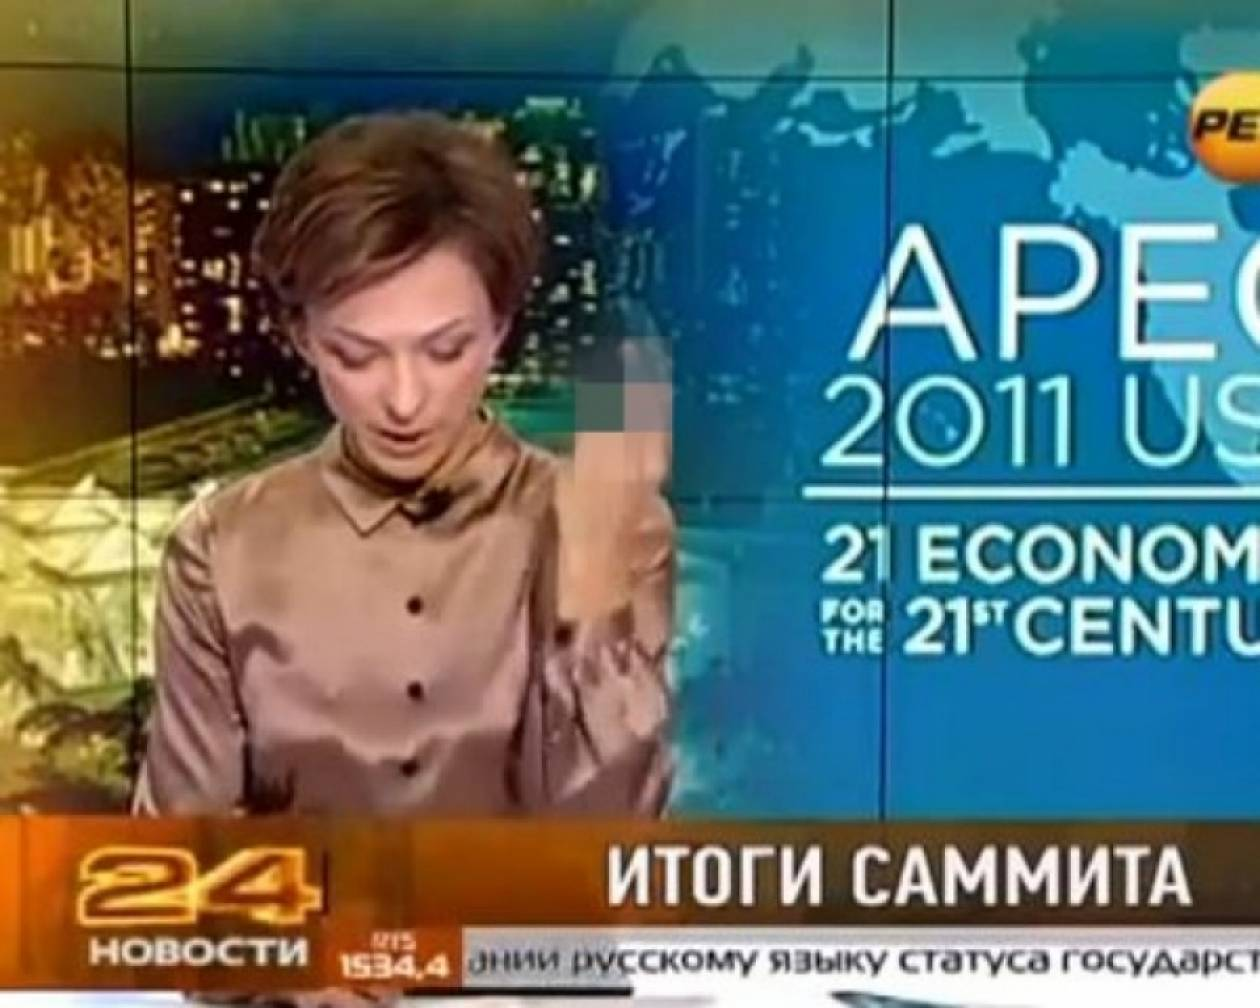 H άσεμνη χειρονομία παρουσιάστριας on air